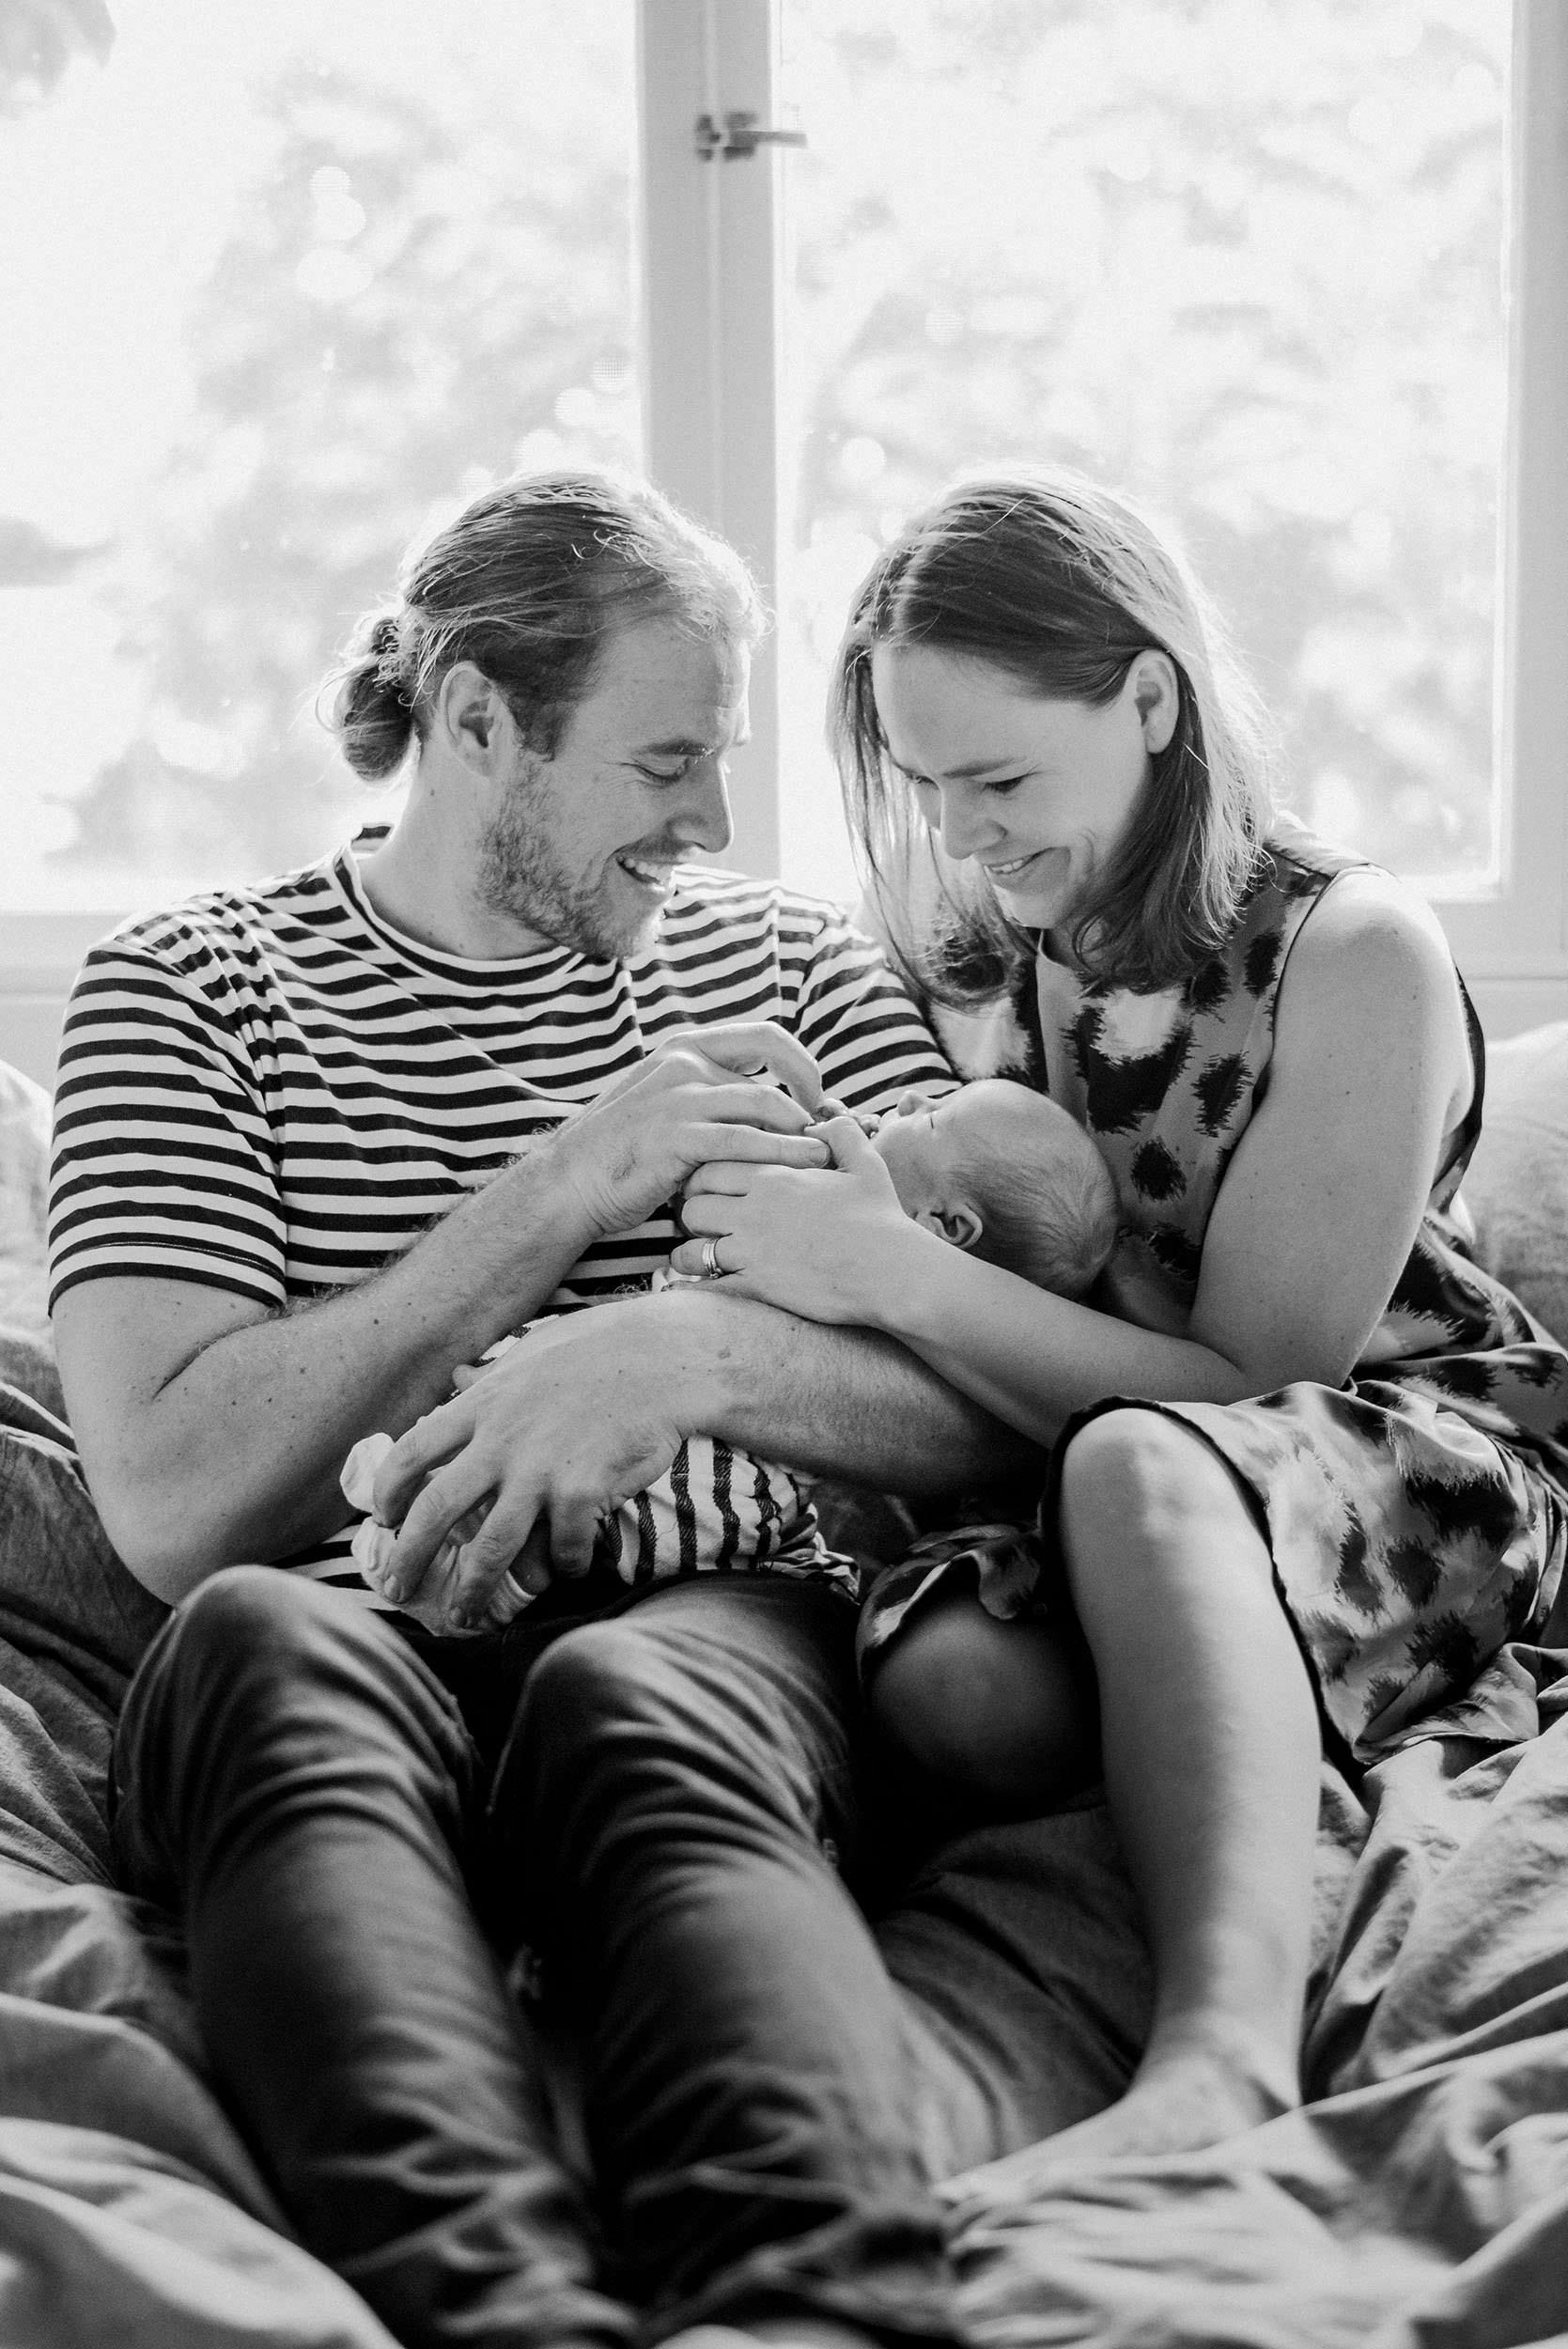 brisbane-family-portrait-photographer-04.jpg